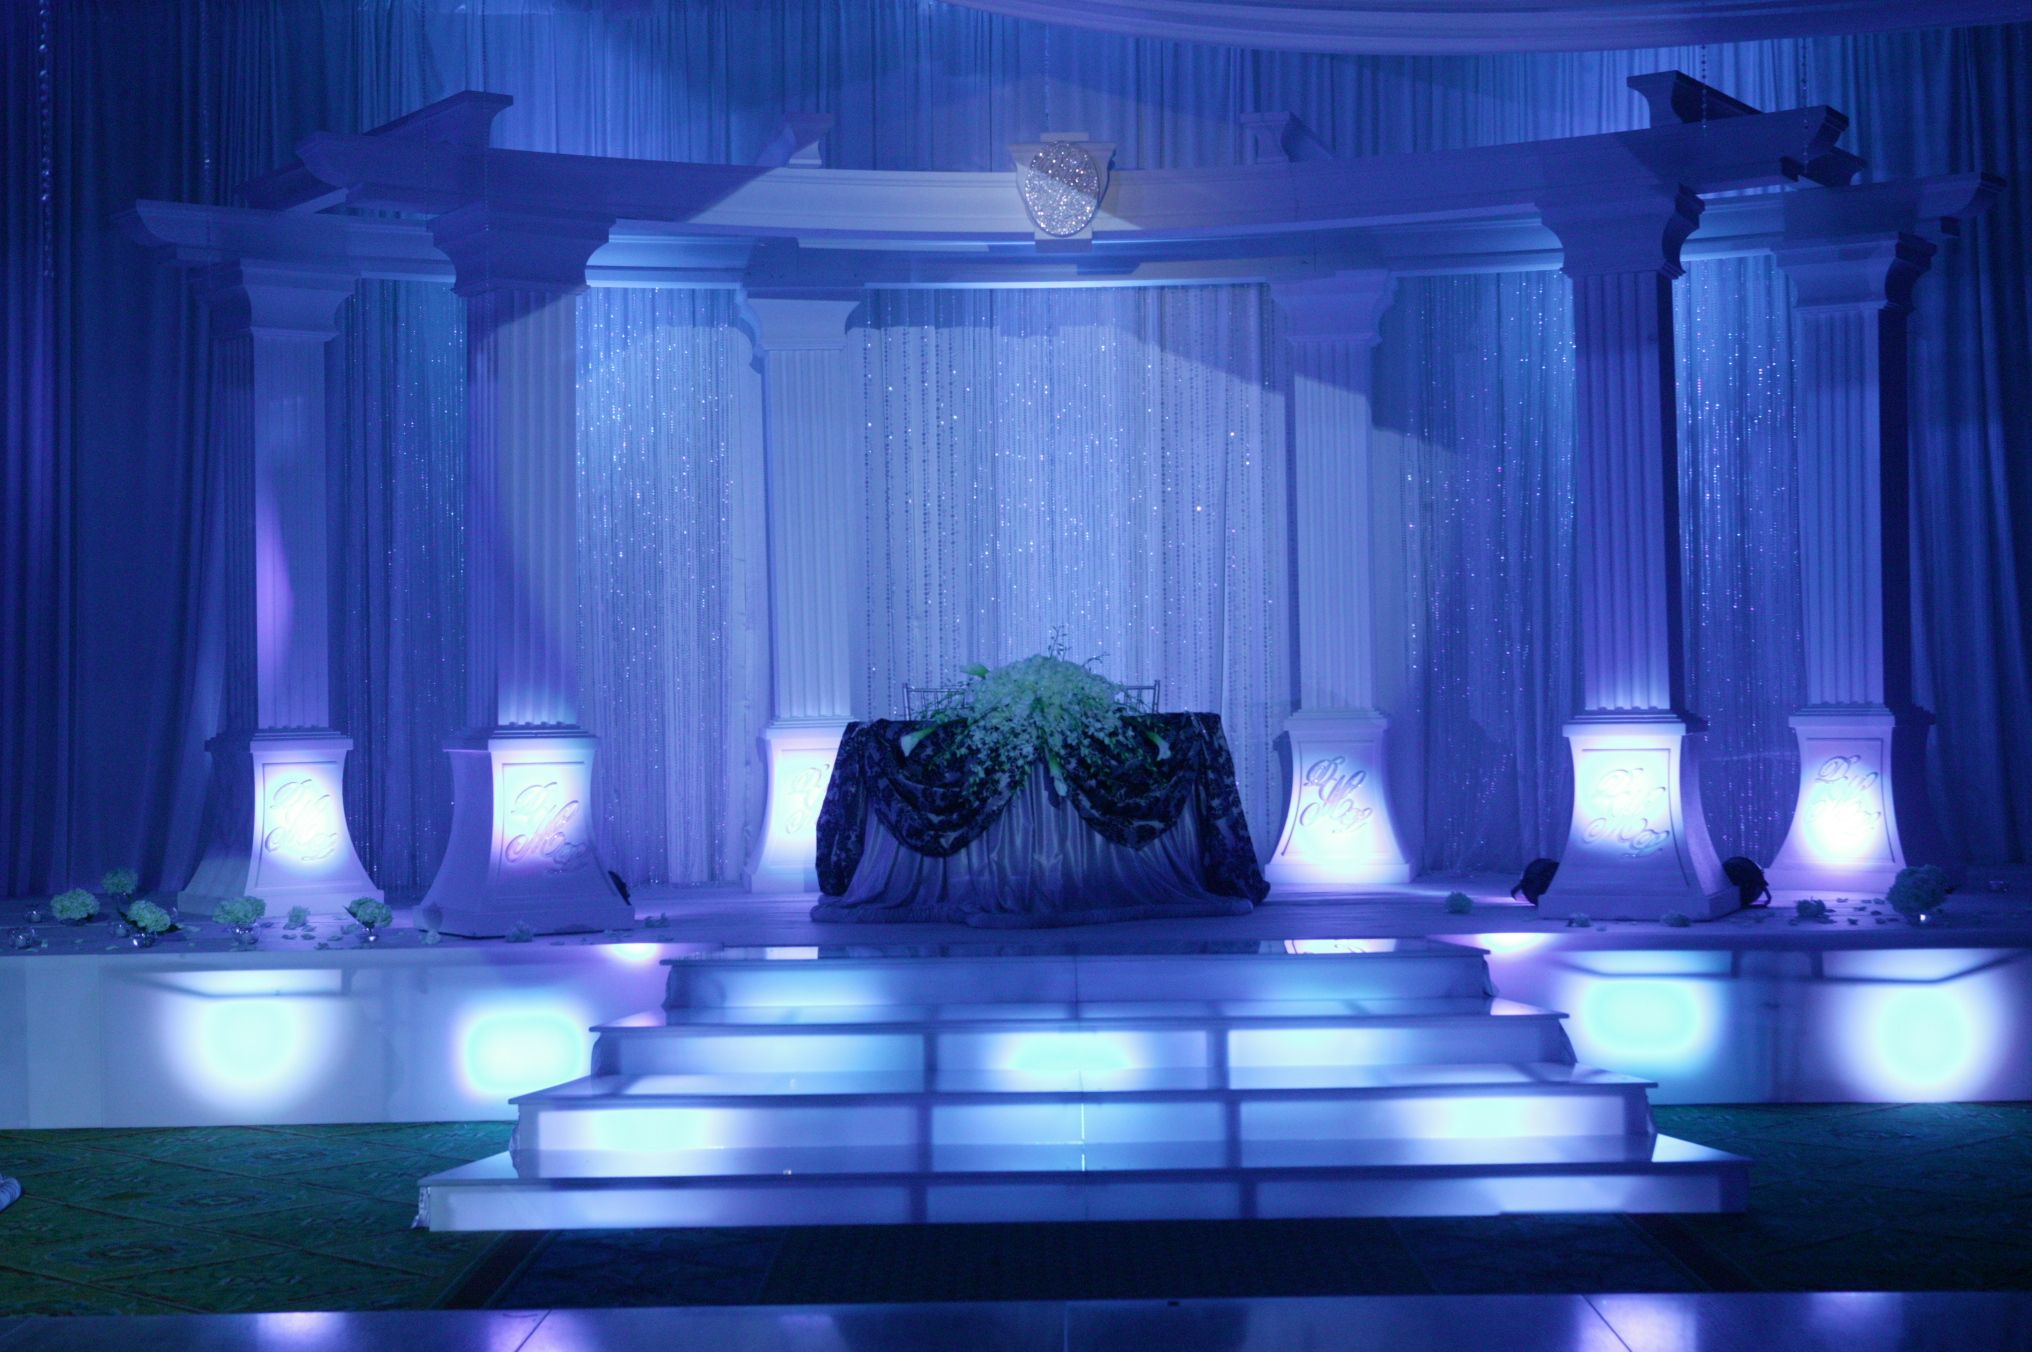 Wedding stage decoration with balloons  Fantasy Designerus Wedding Stage  Backdrops  Pinterest  Wedding